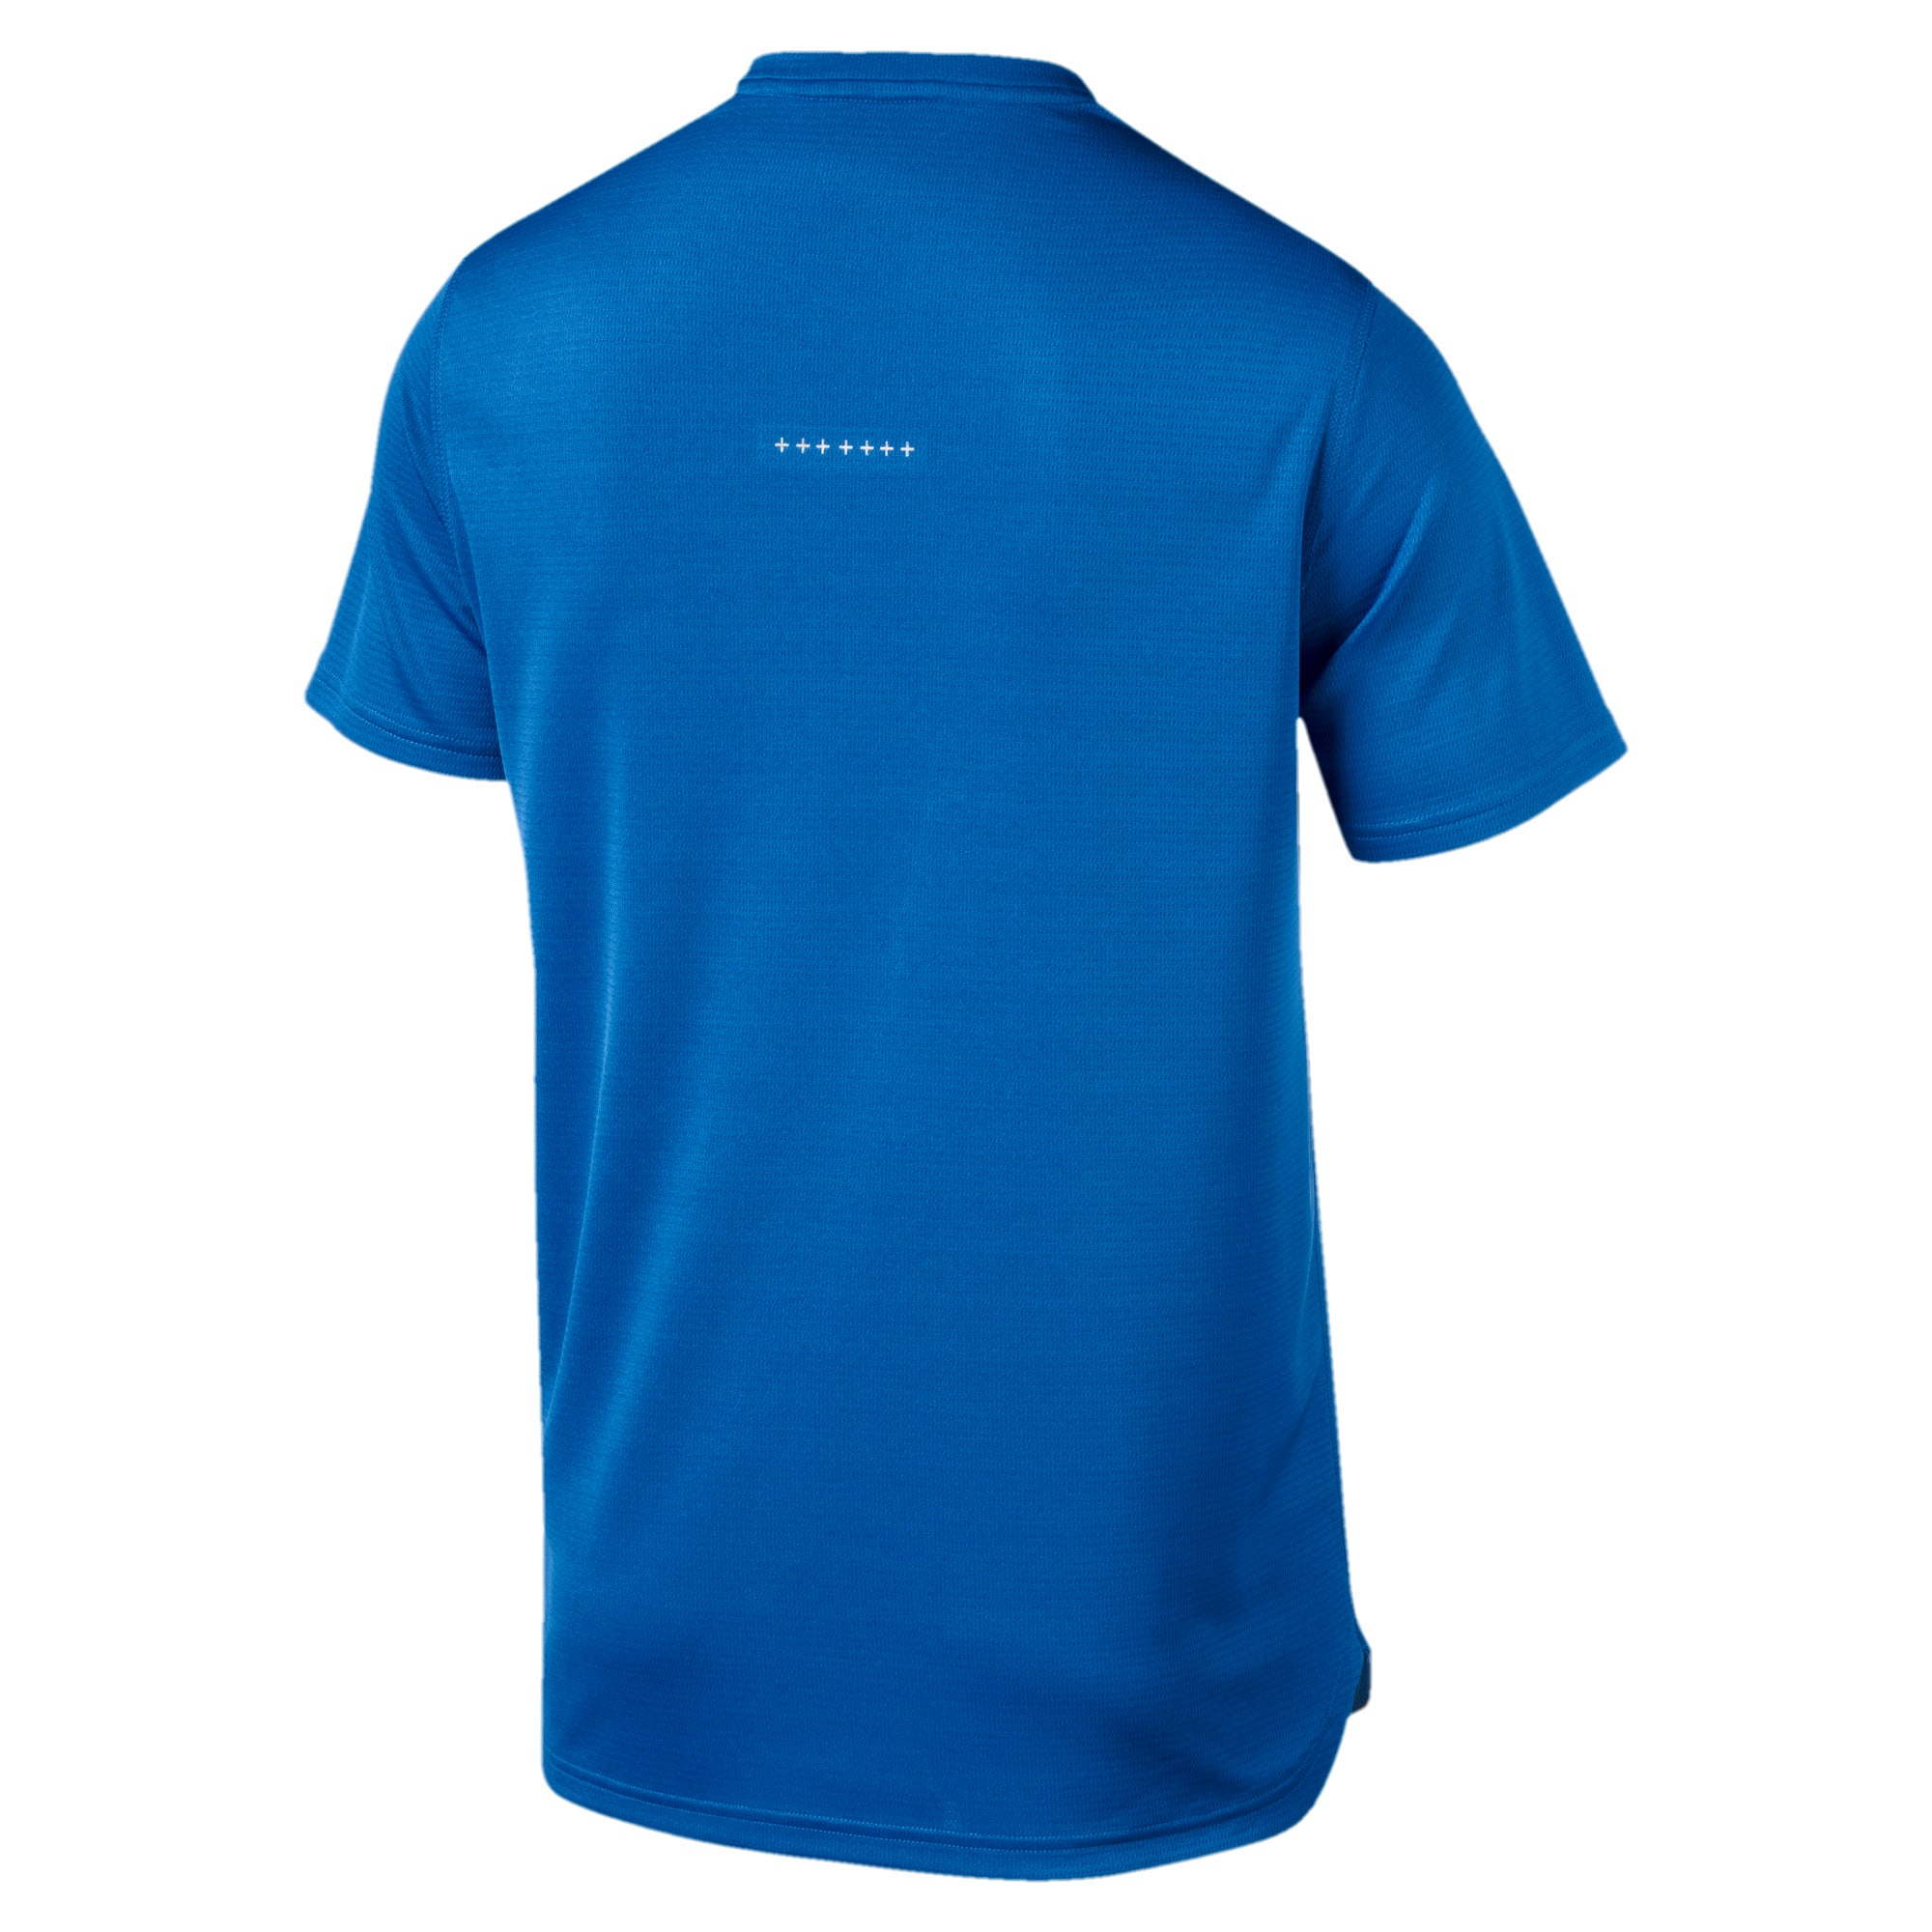 Thumbnail 3 of Running Men's IGNITE Mono T-Shirt, Strong Blue, medium-IND